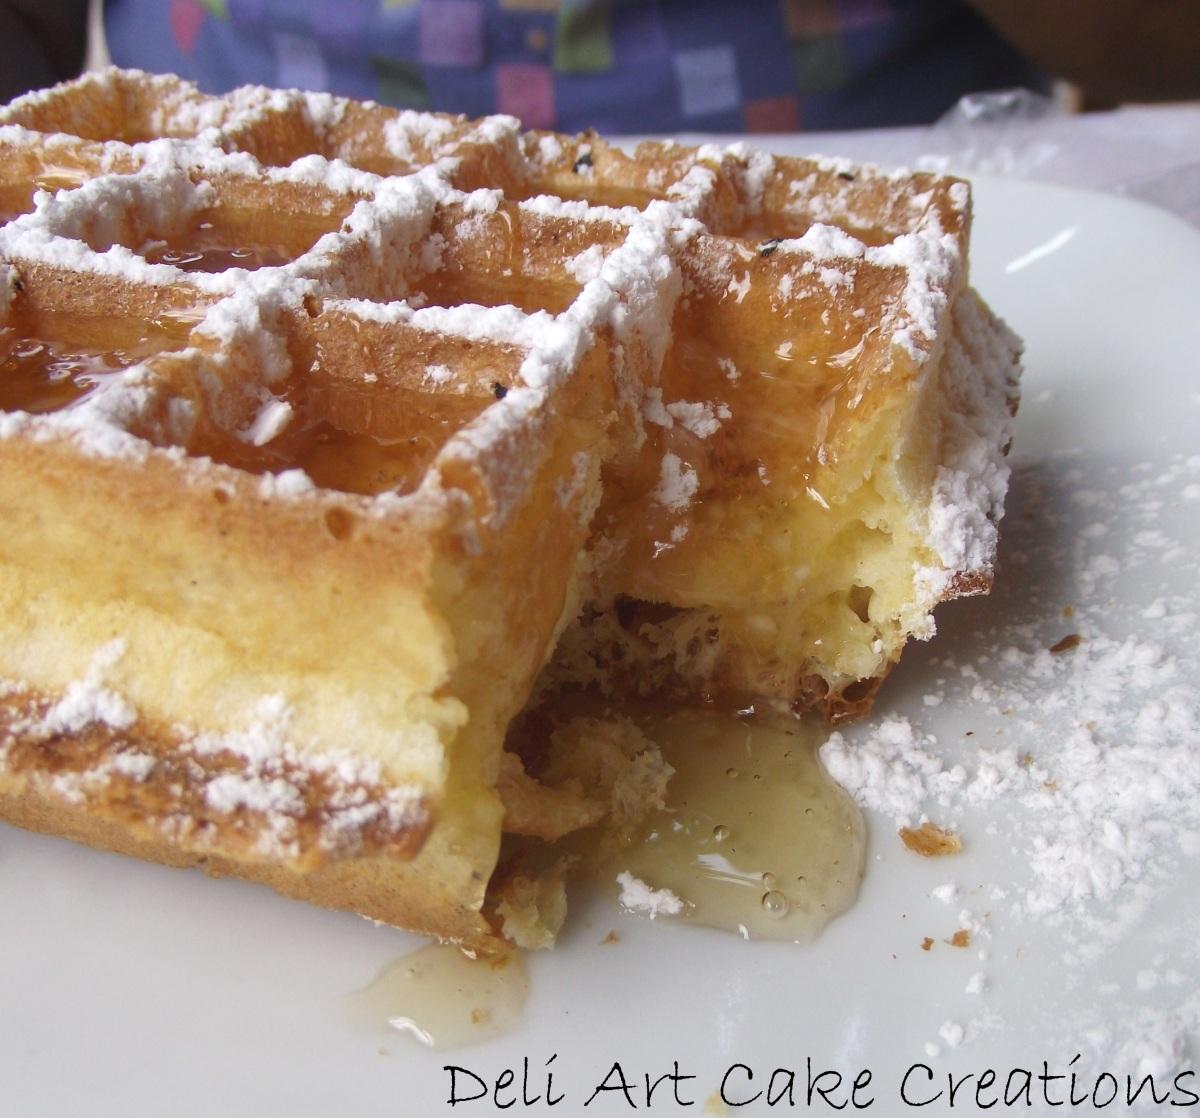 Blog Deli Art Cake Creations : Waffles Deli Art Cake Creations